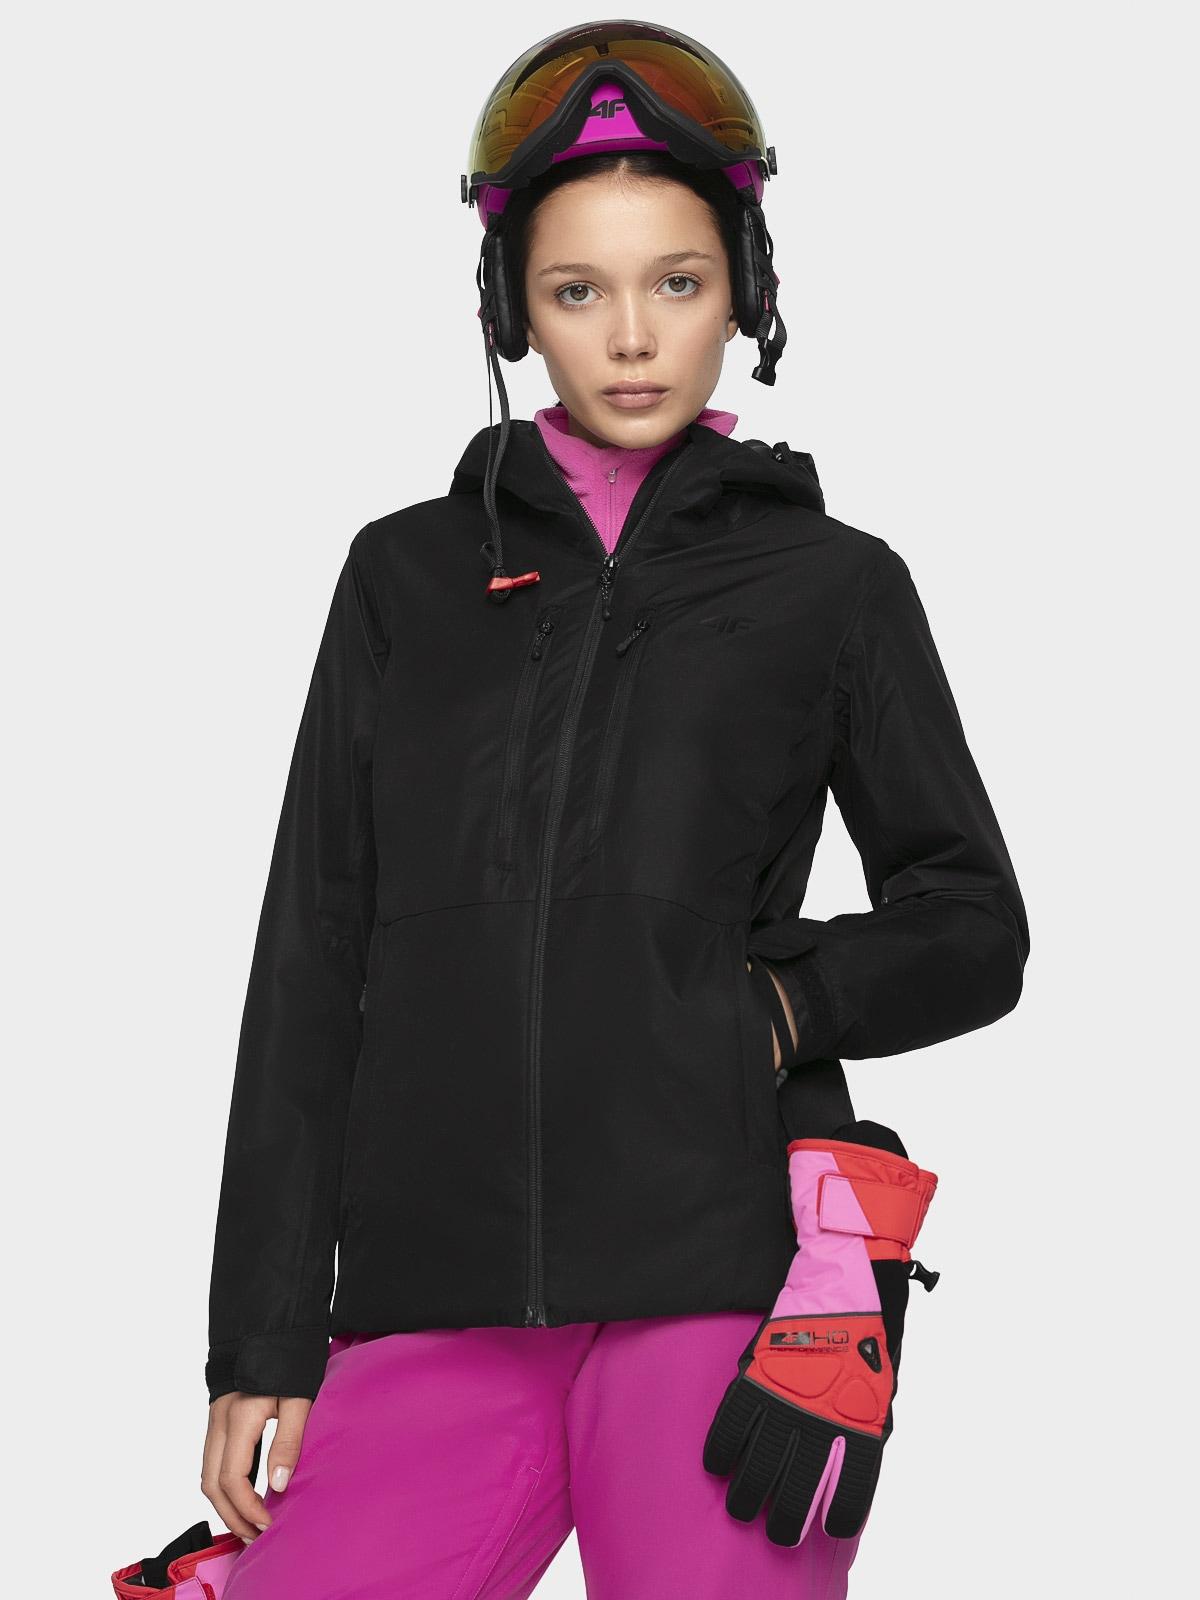 Kurtka narciarska damska KUDN301 - głęboka czerń